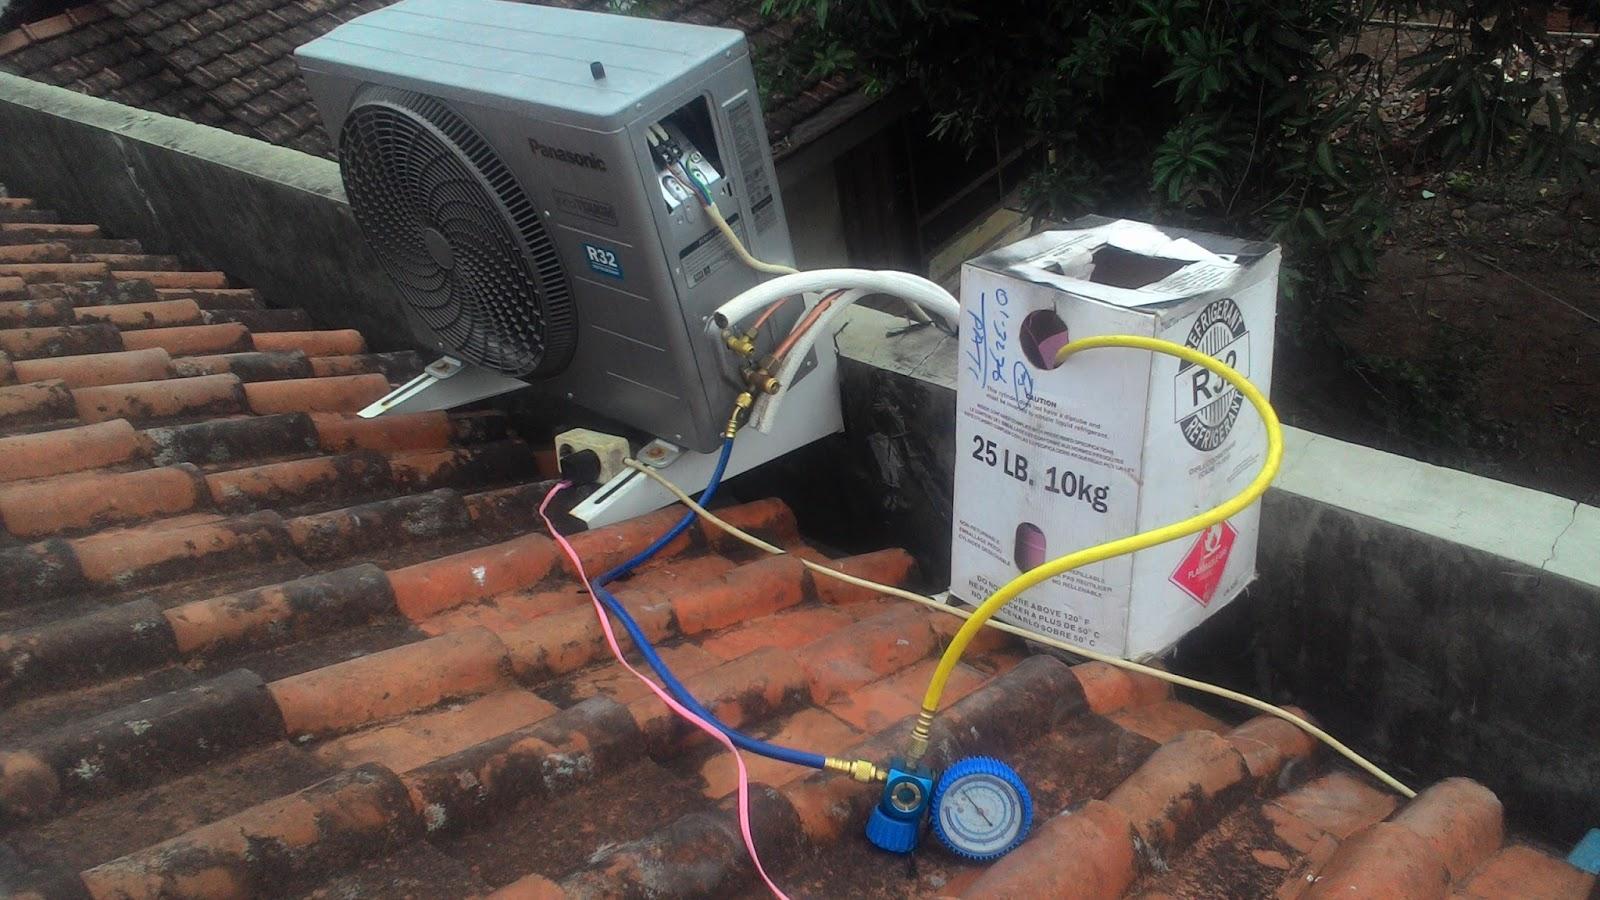 Ac Freon Jual Cari Murah Call 031 78316310 A C Pro Refrigerant R 134a R134a W Dispenser 397 G Isi Refri